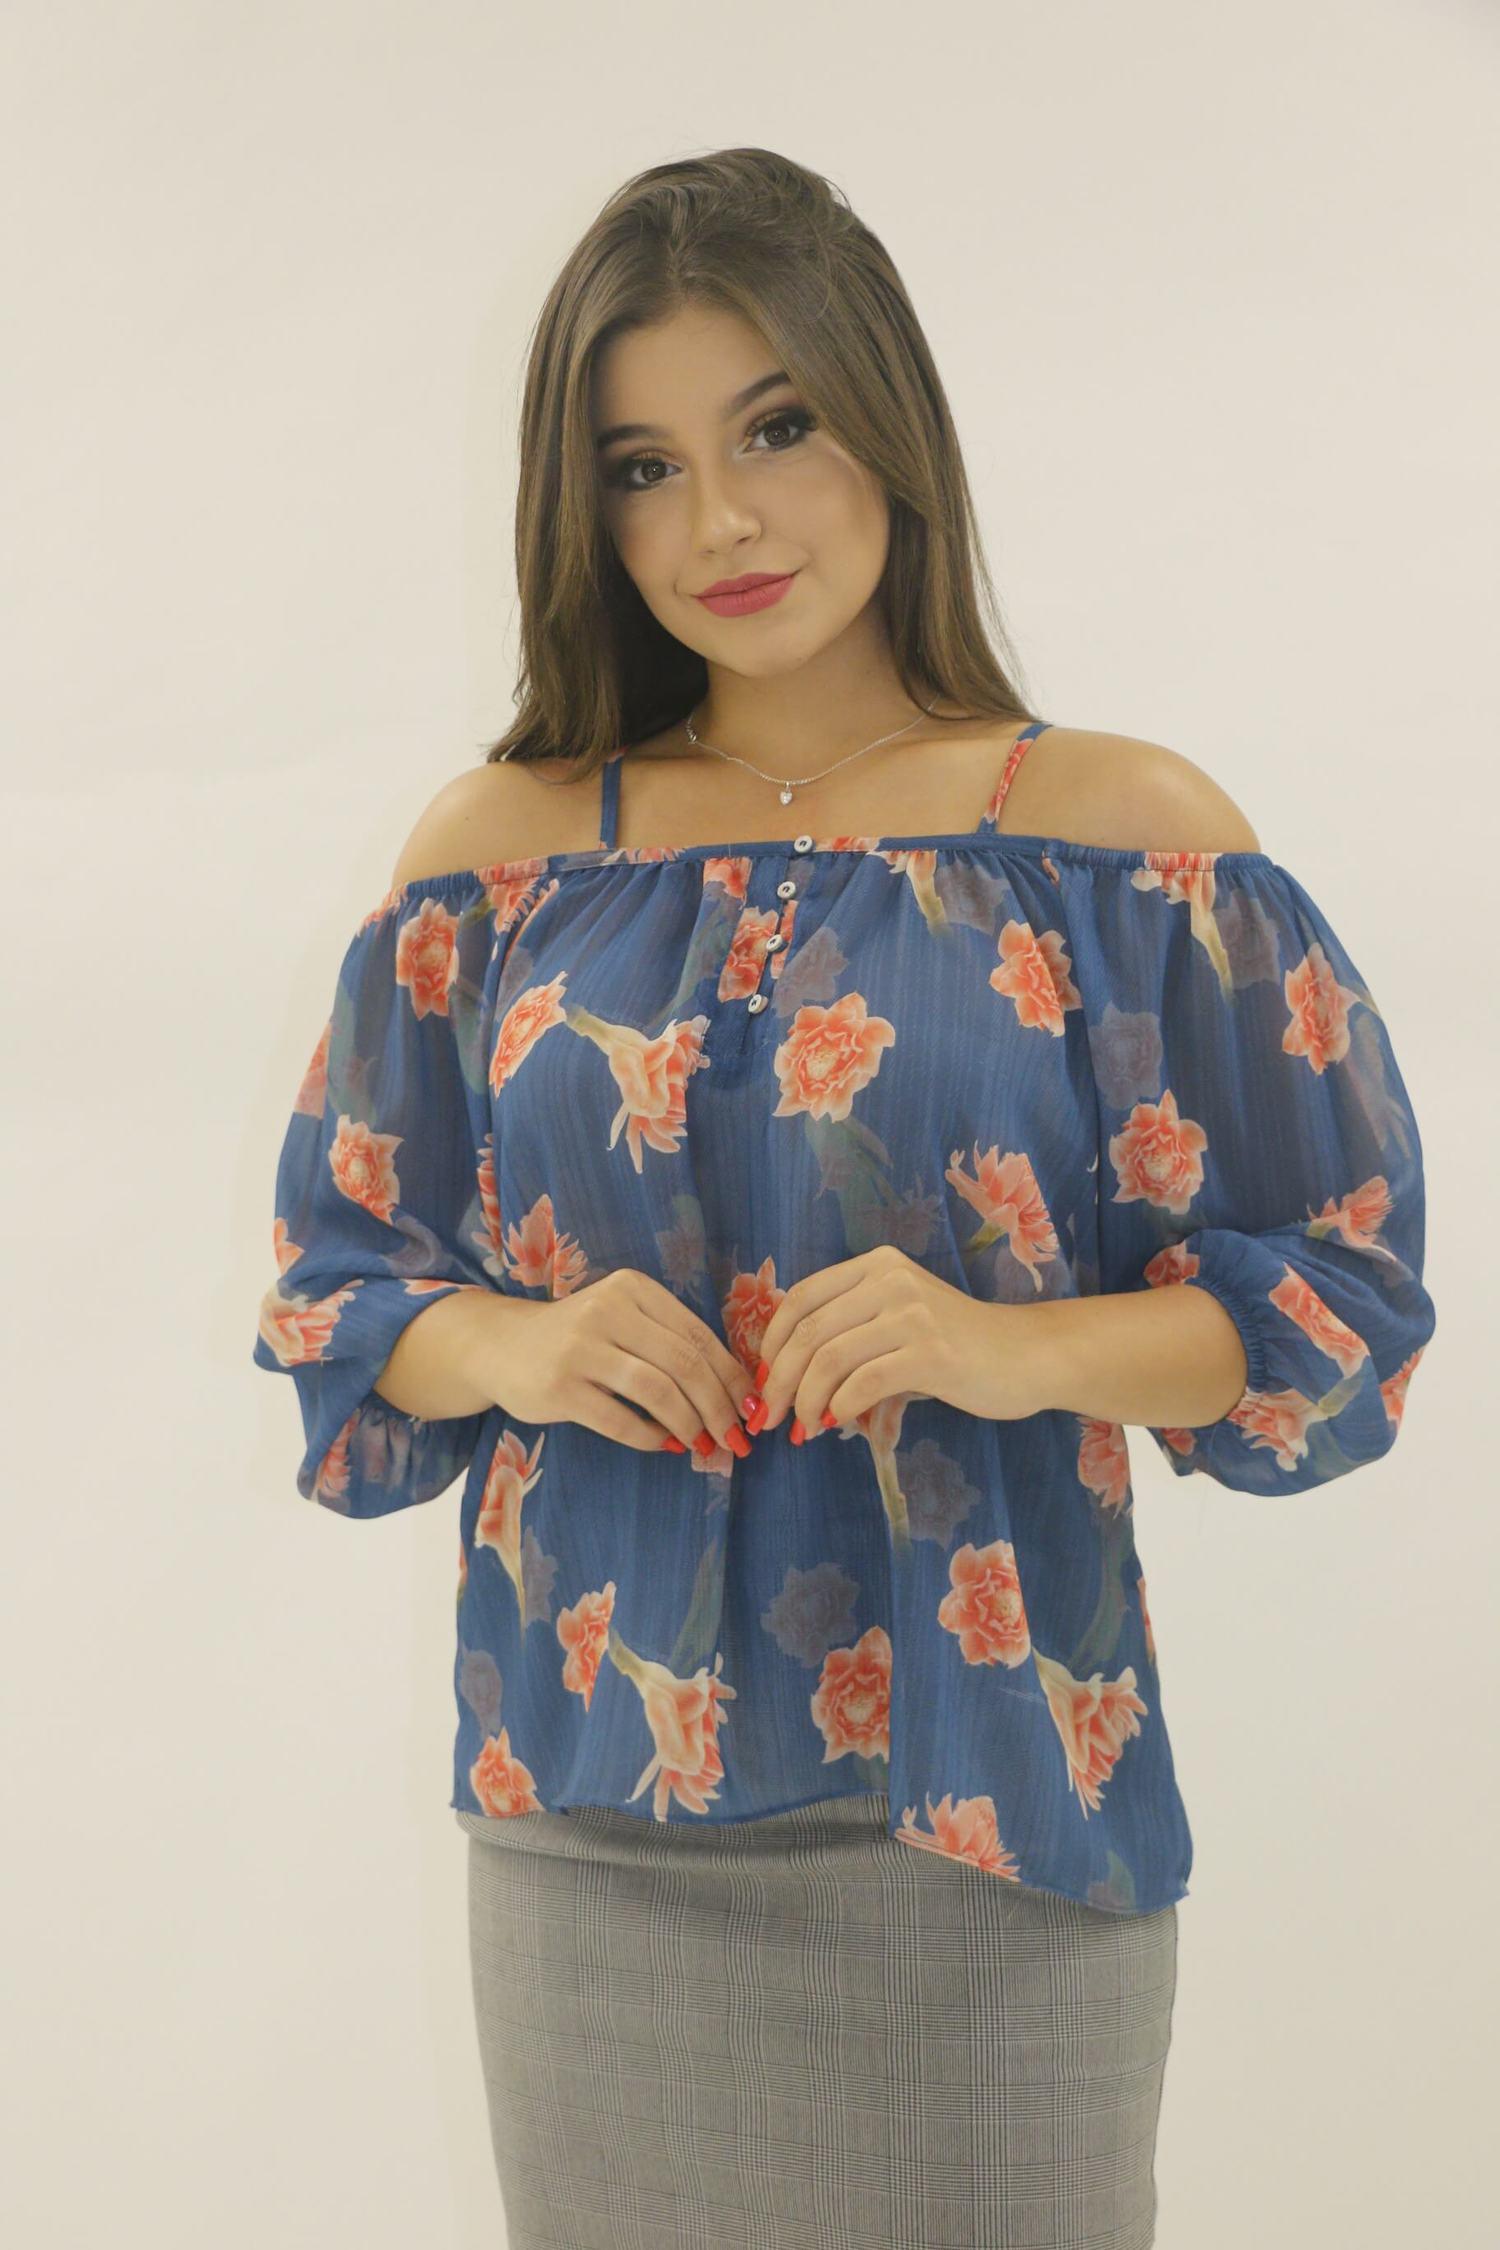 Blusa manga 3/4 ombro a ombro azul com flores